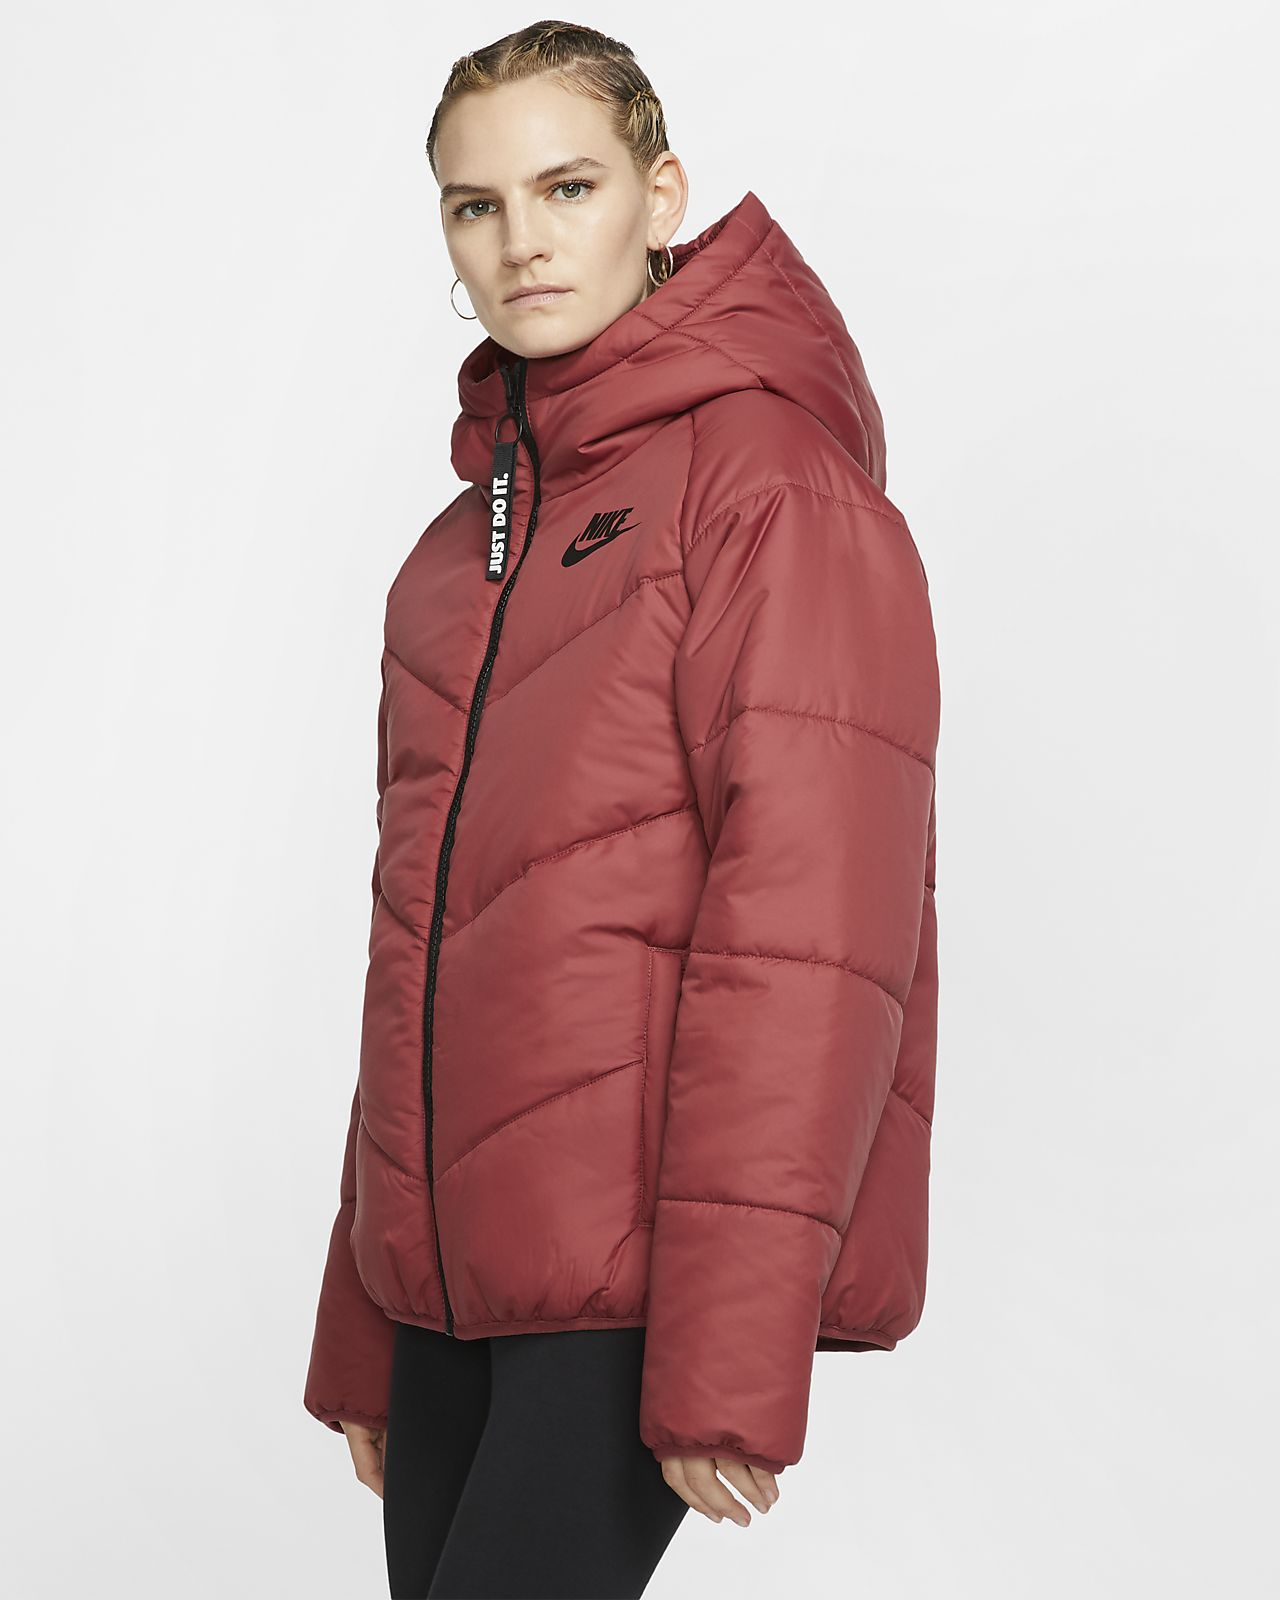 Nike Sportswear Windrunner kapucnis női kabát